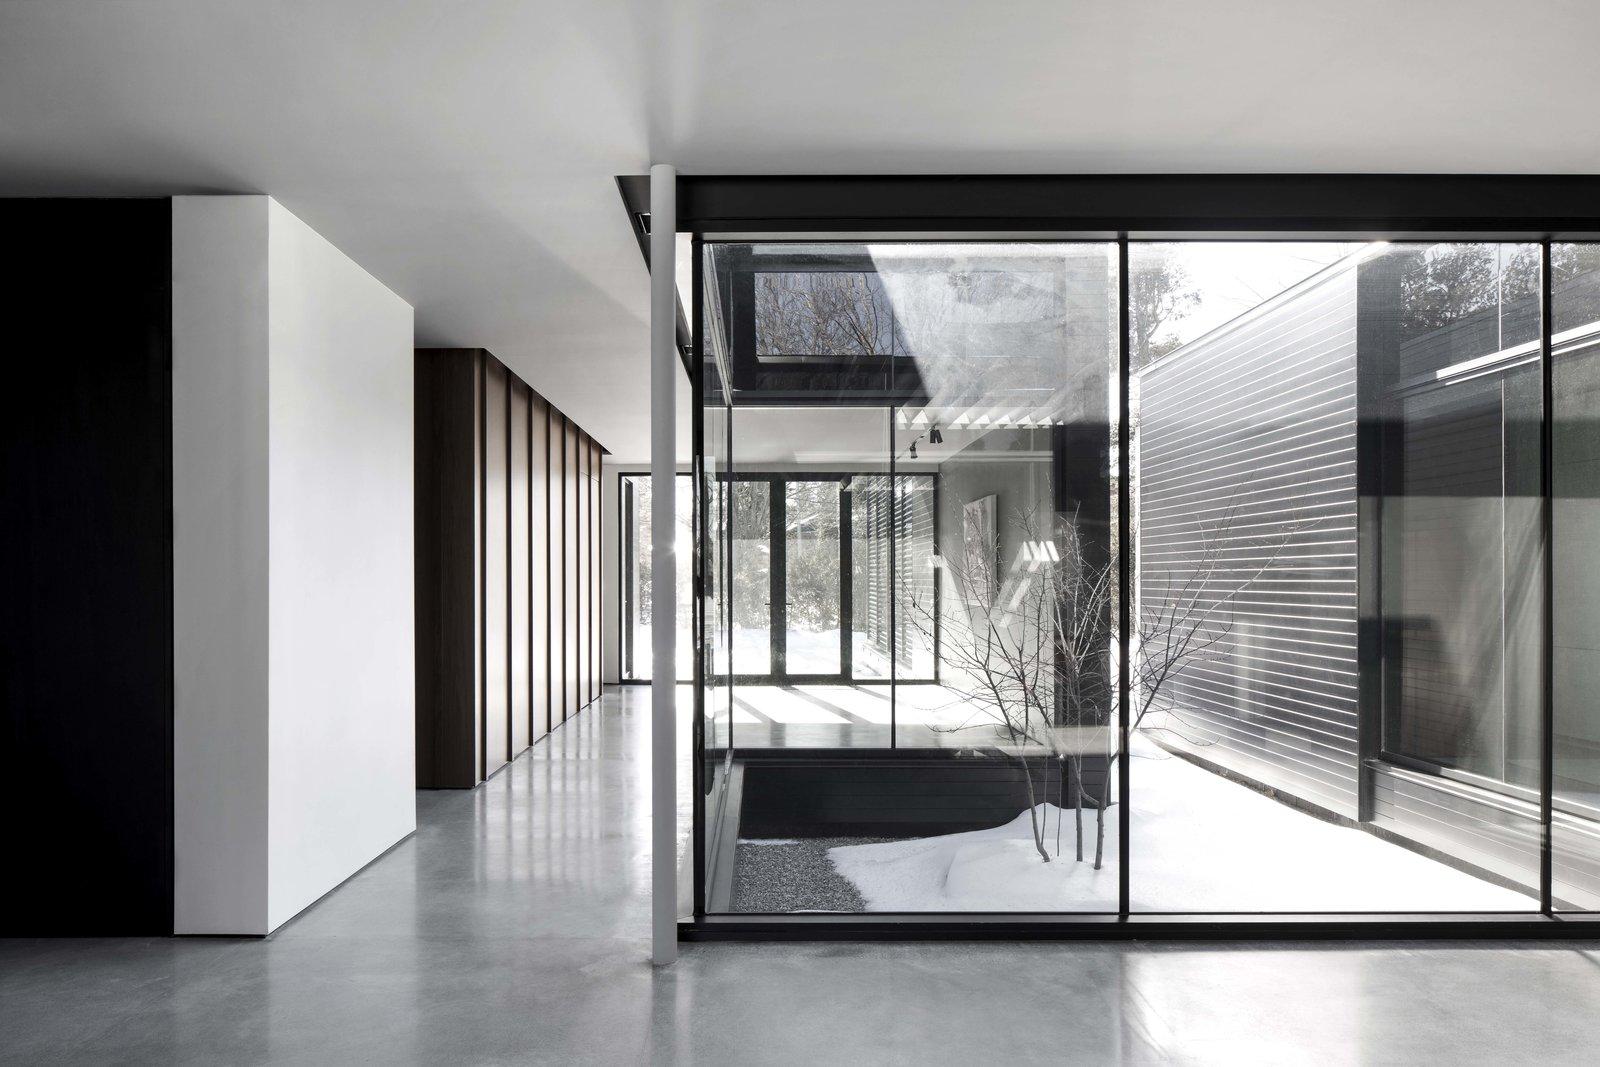 Hallway and Concrete Floor  True North by Alain Carle Architecte